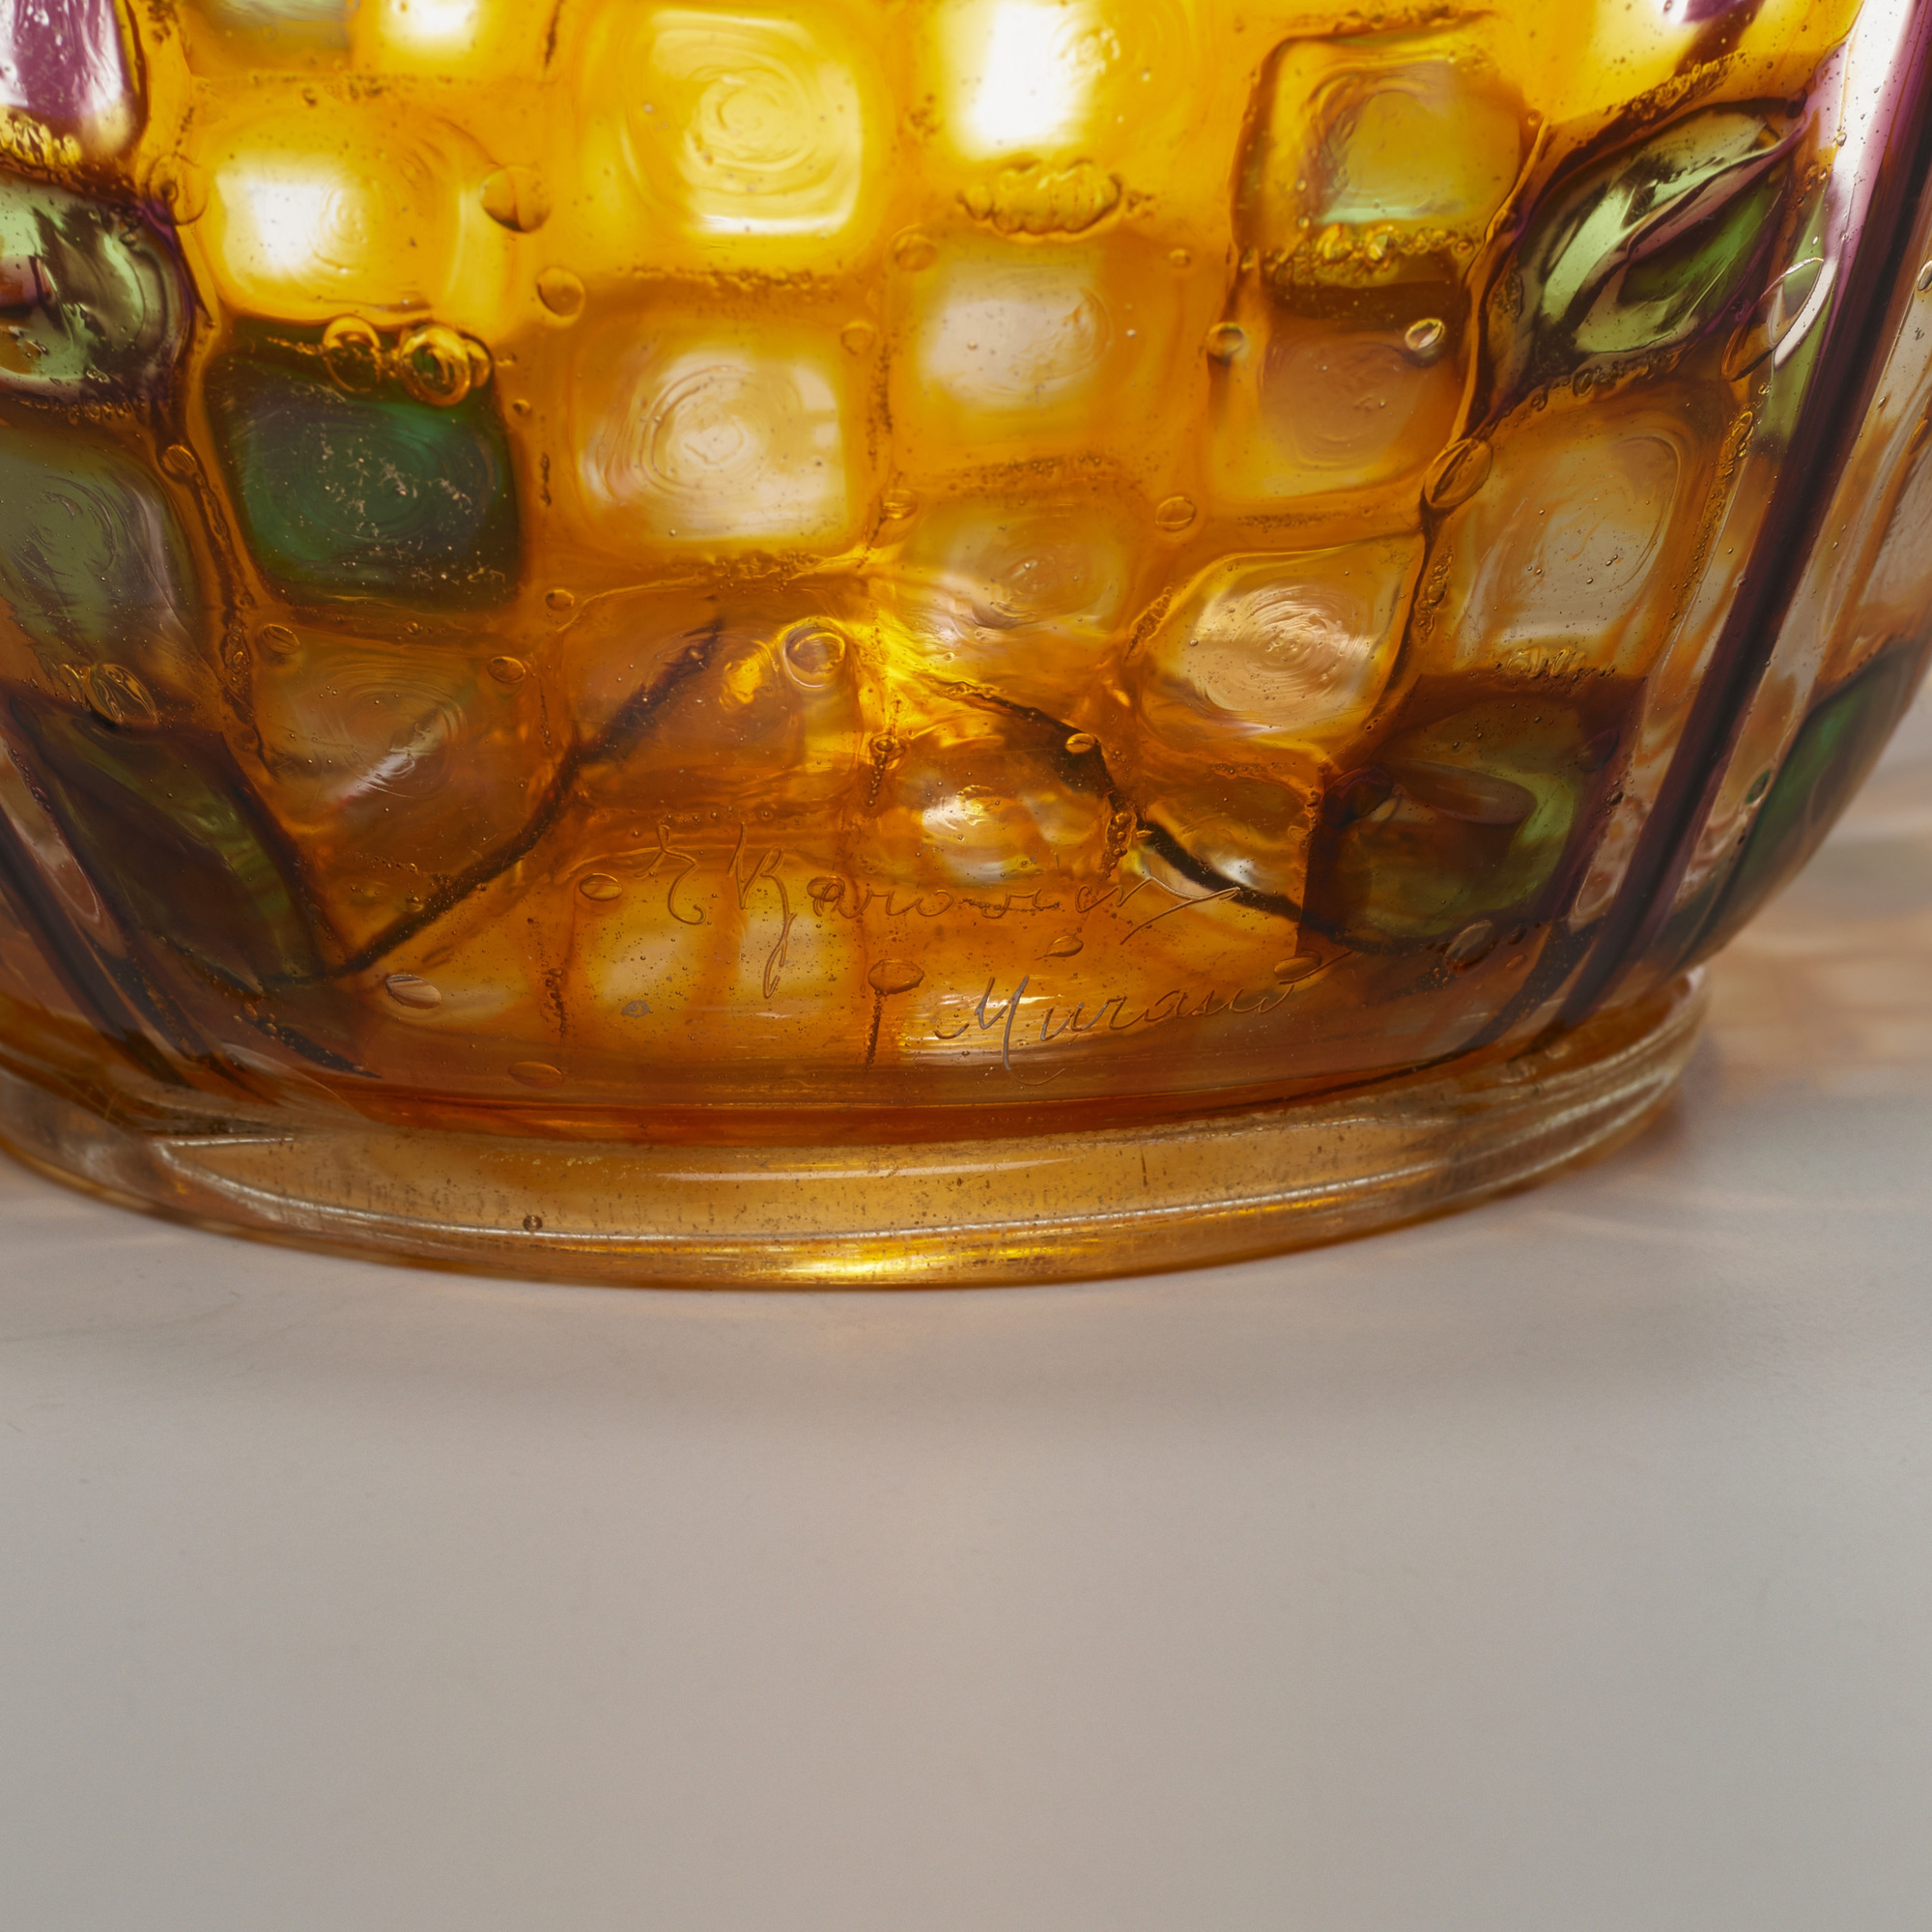 34: Ercole Barovier / Important Mosaico vase (4 of 4)